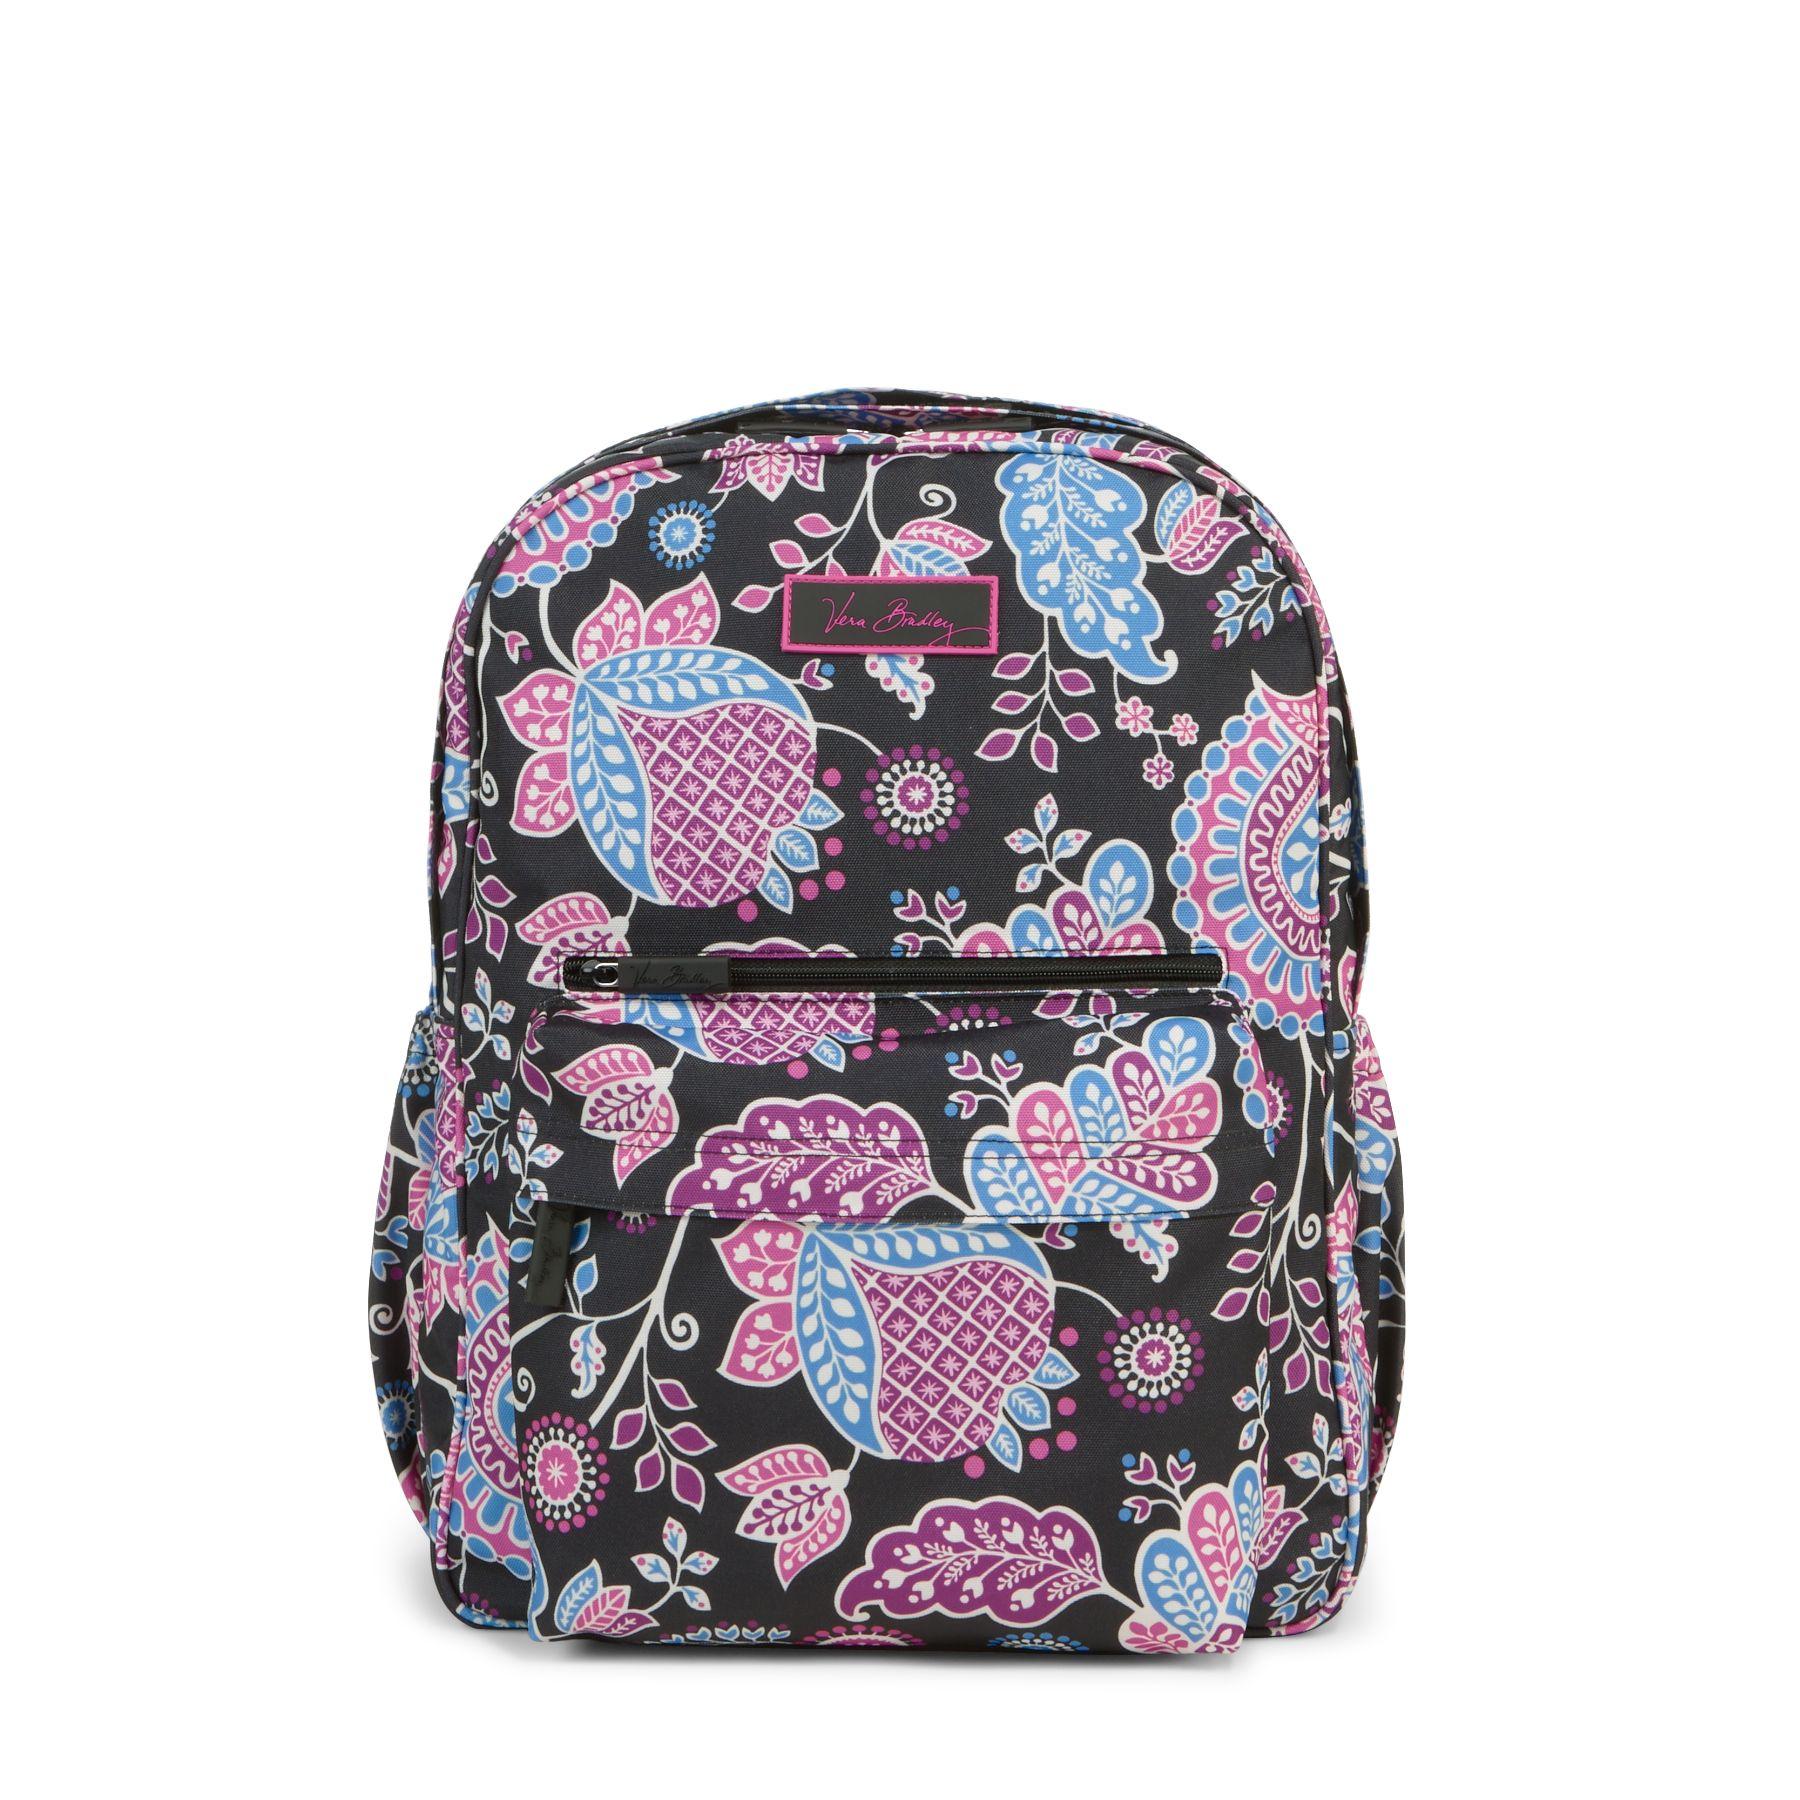 Vintage Floral Backpack Vera Bradley - Ken Chad Consulting Ltd d051db83ca